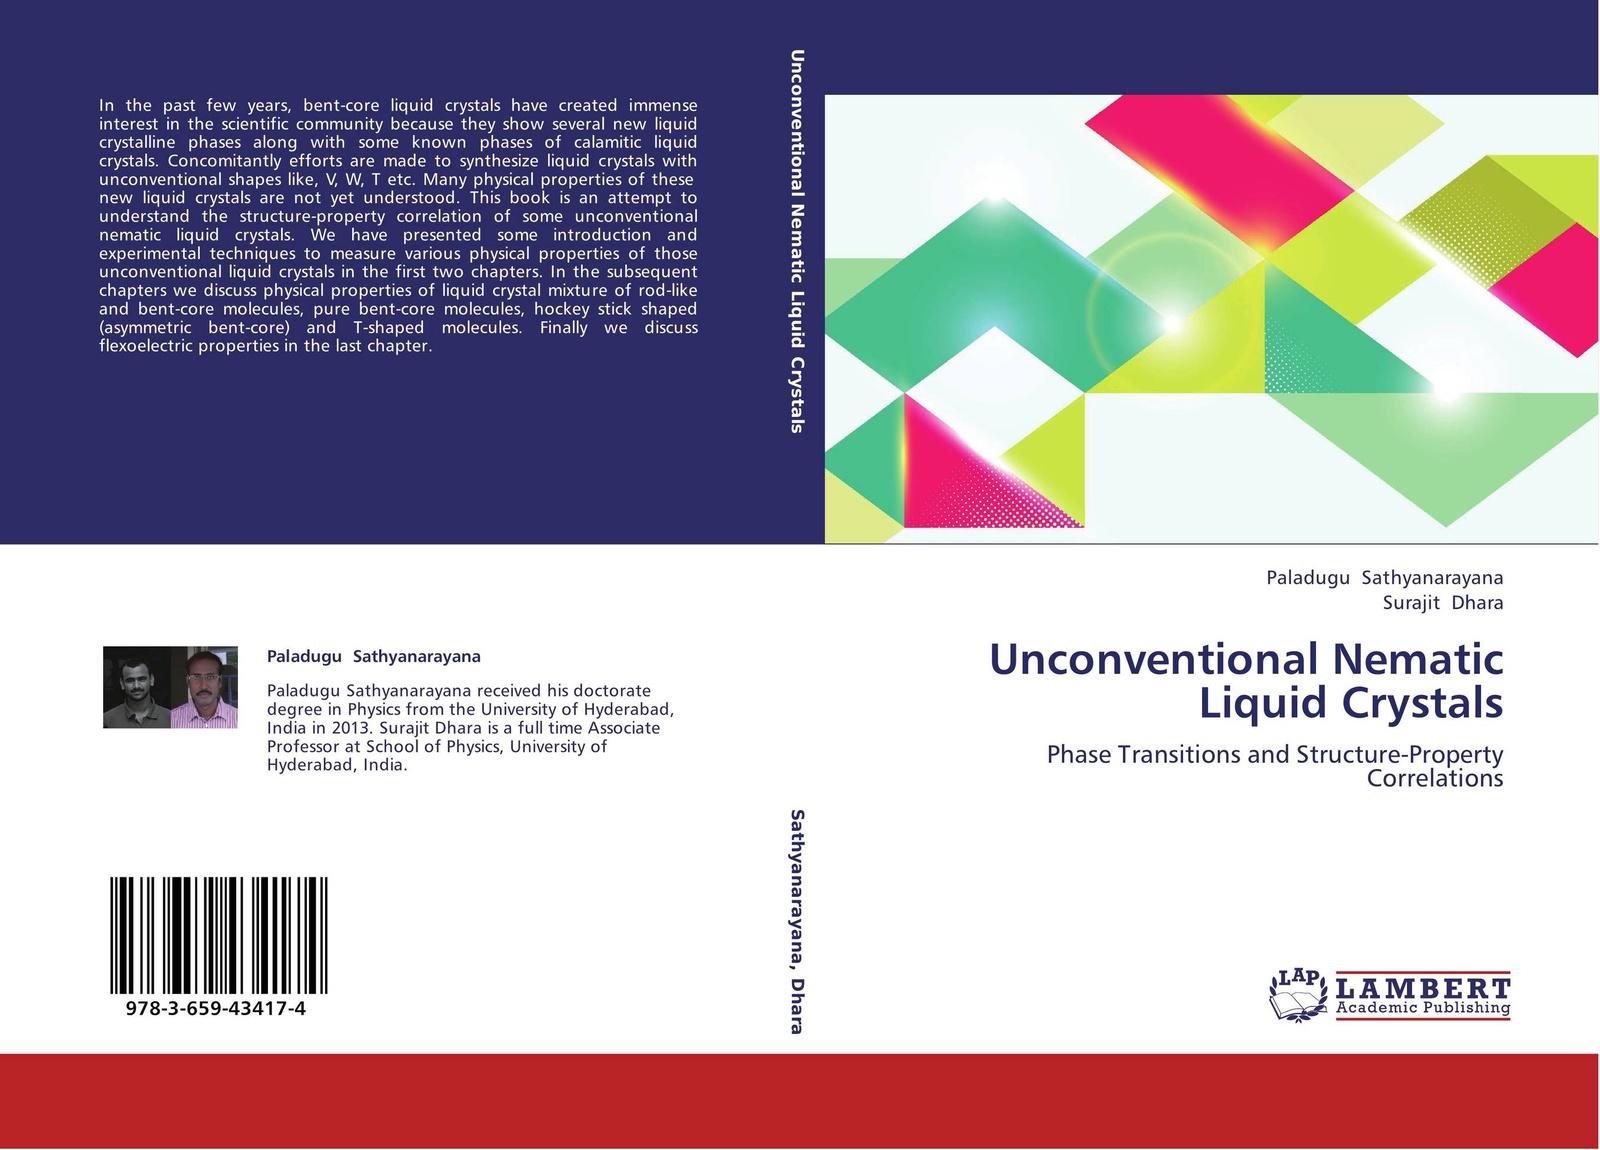 Paladugu Sathyanarayana and Surajit Dhara Unconventional Nematic Liquid Crystals